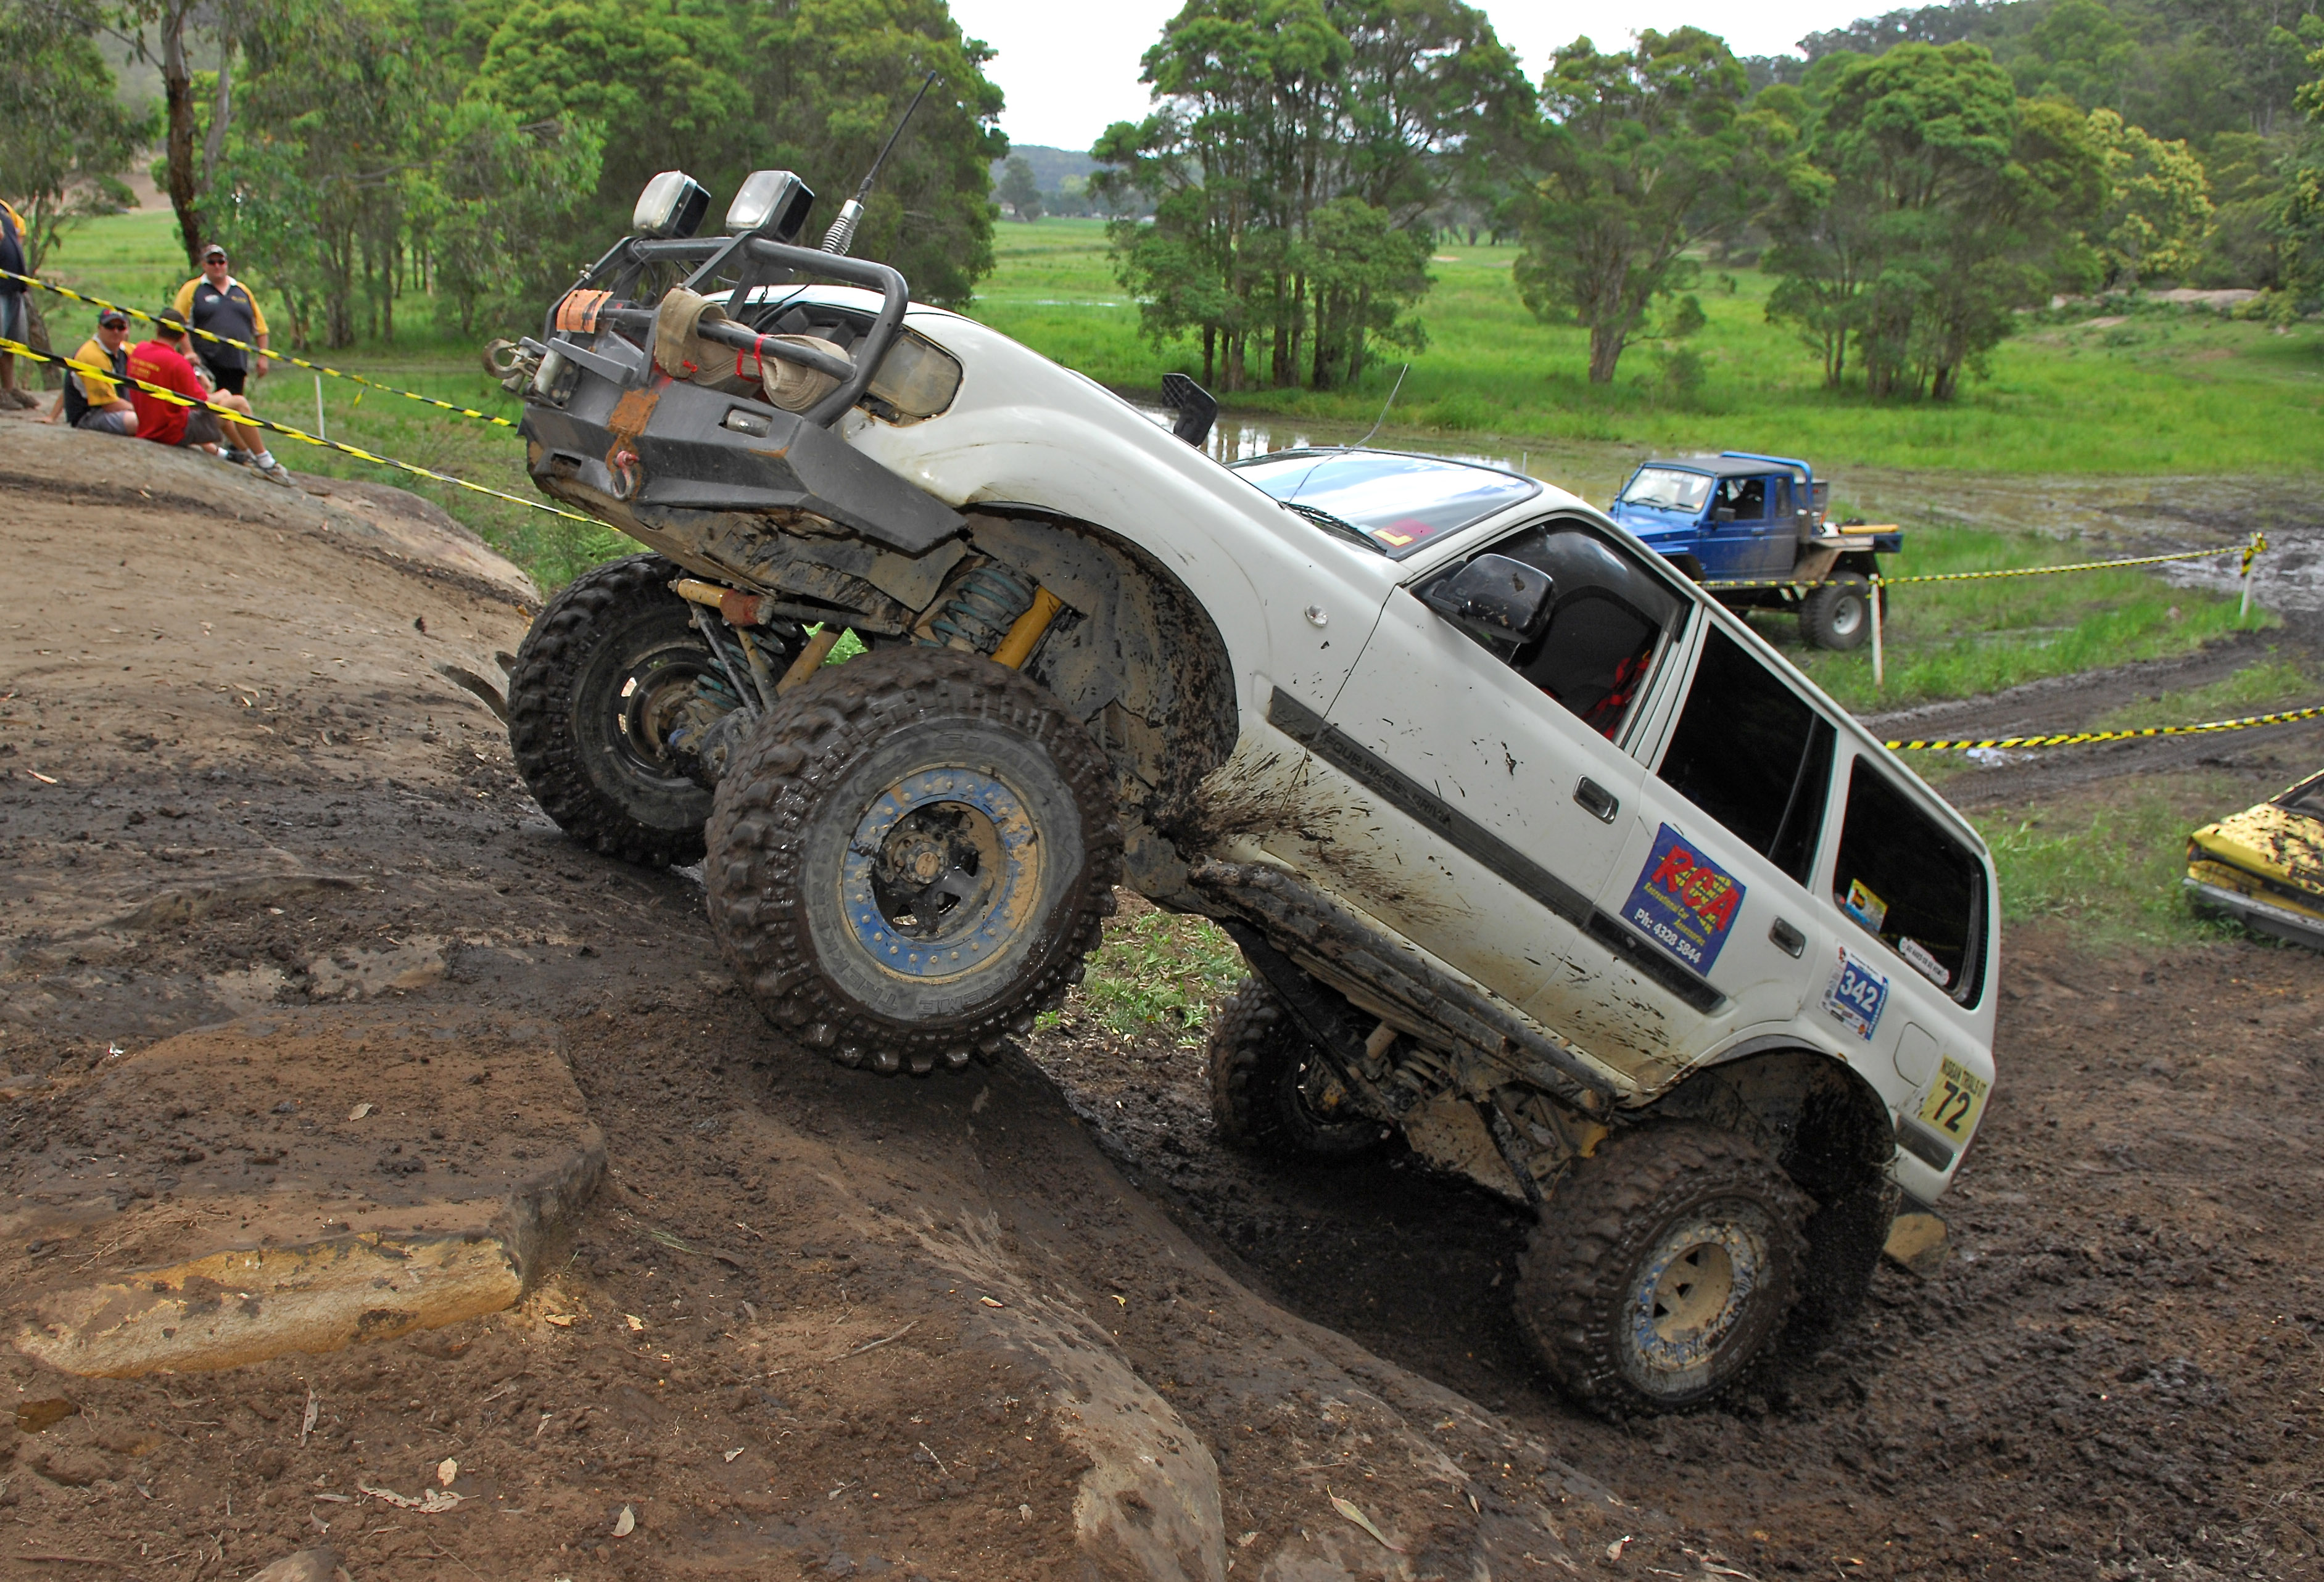 Build Toyota Land Cruiser Truck Body Kit